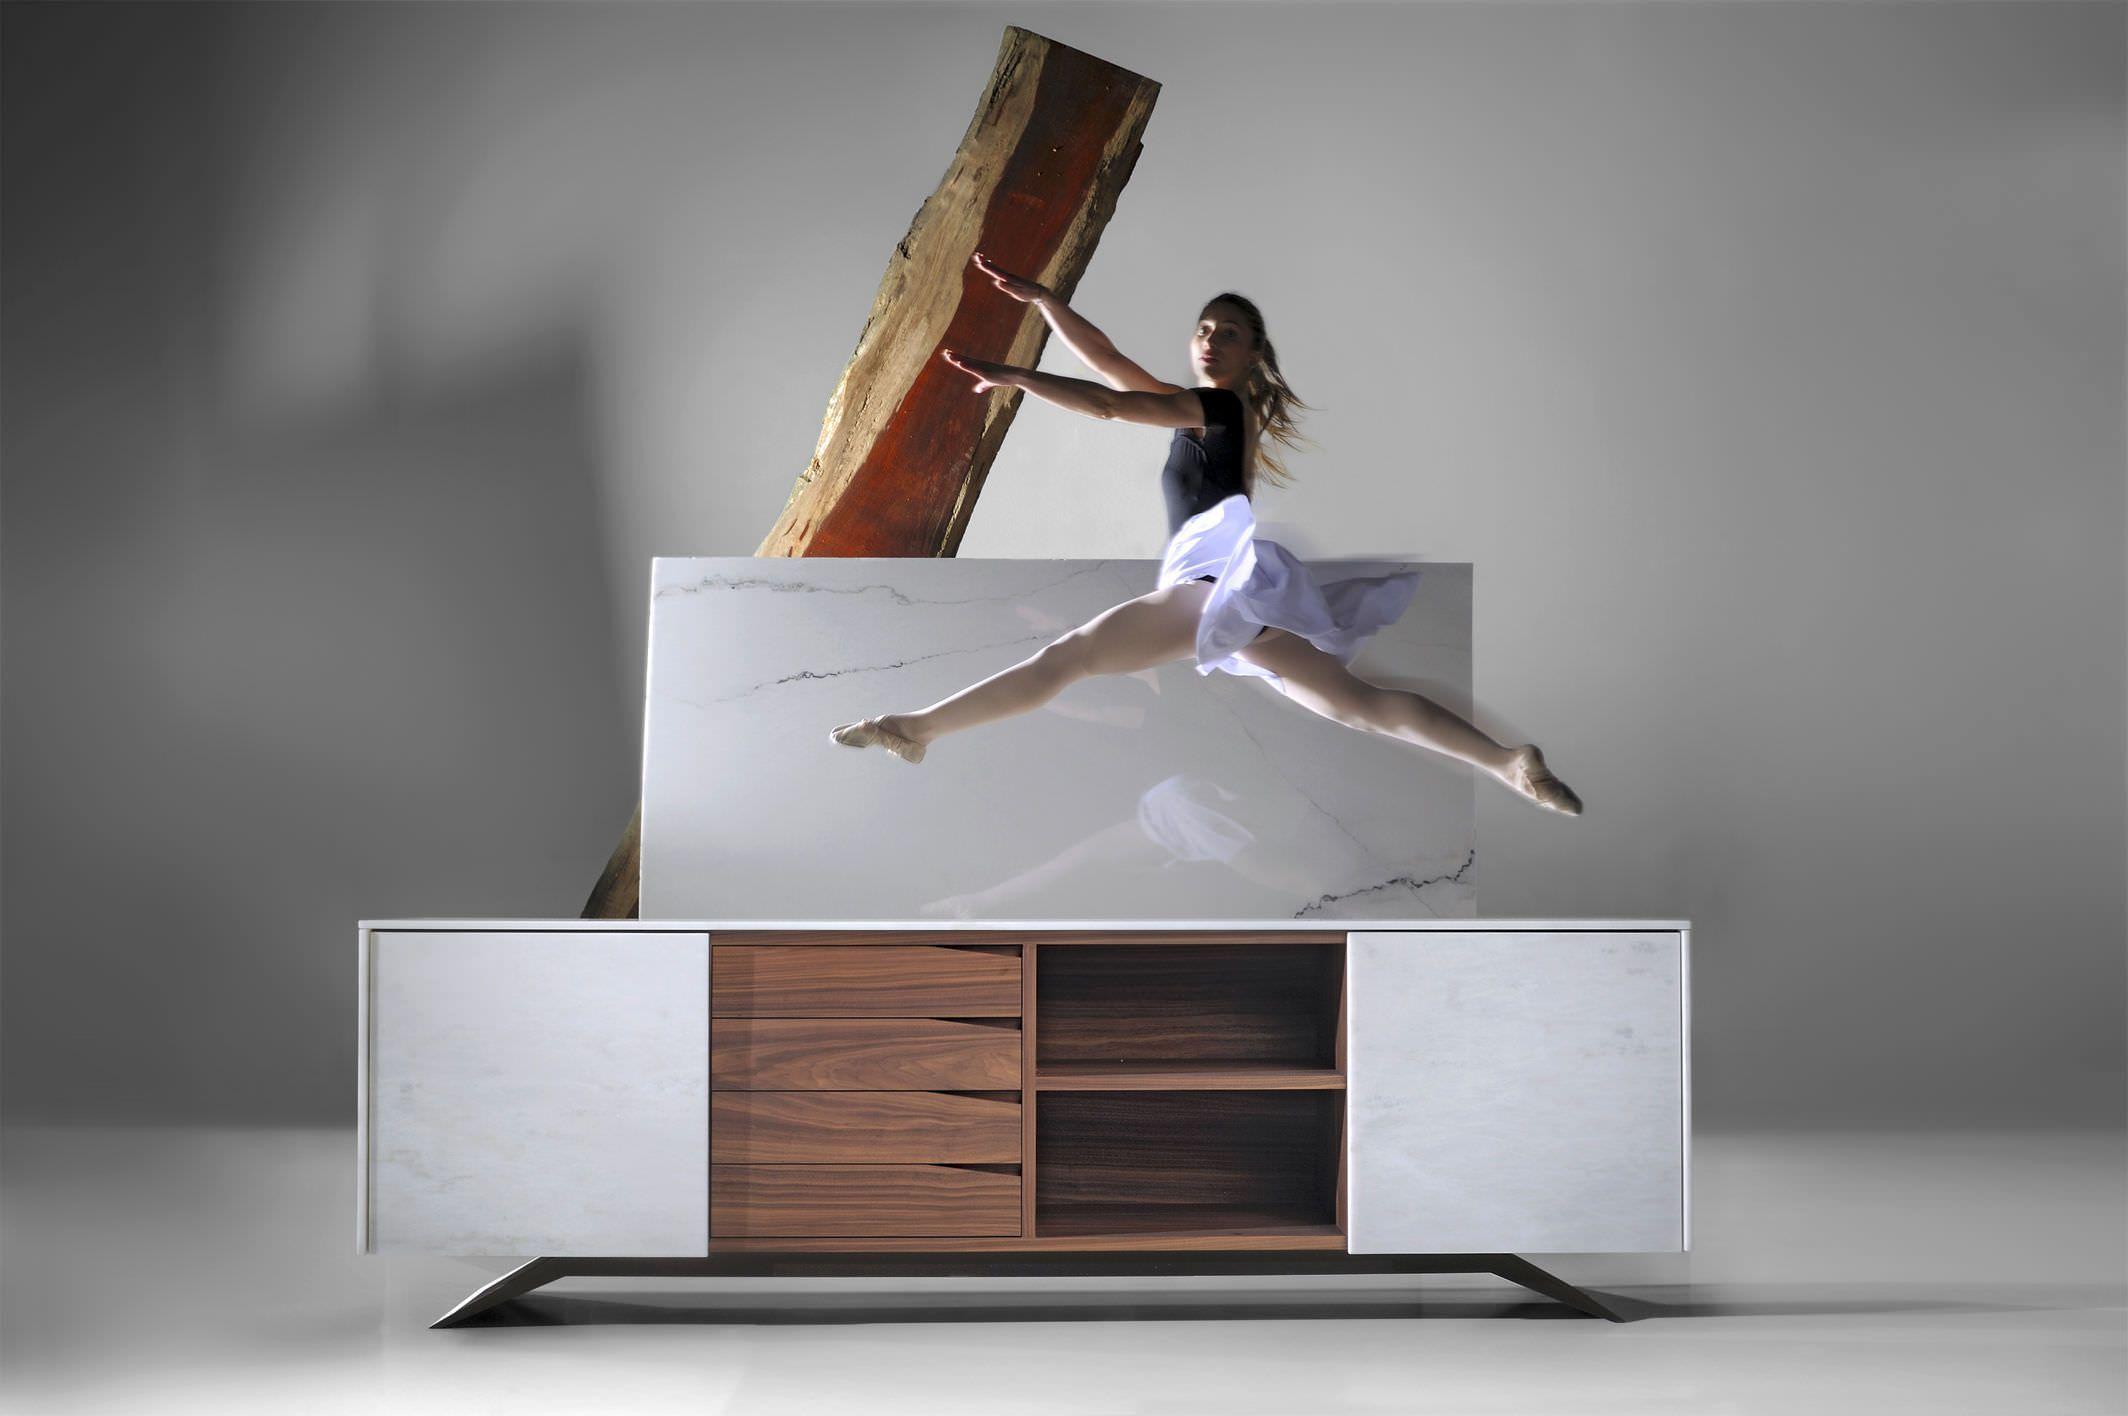 Credenza Moderna Bianca Legno : Credenza moderna in marmo legno bianca trigono by fábio